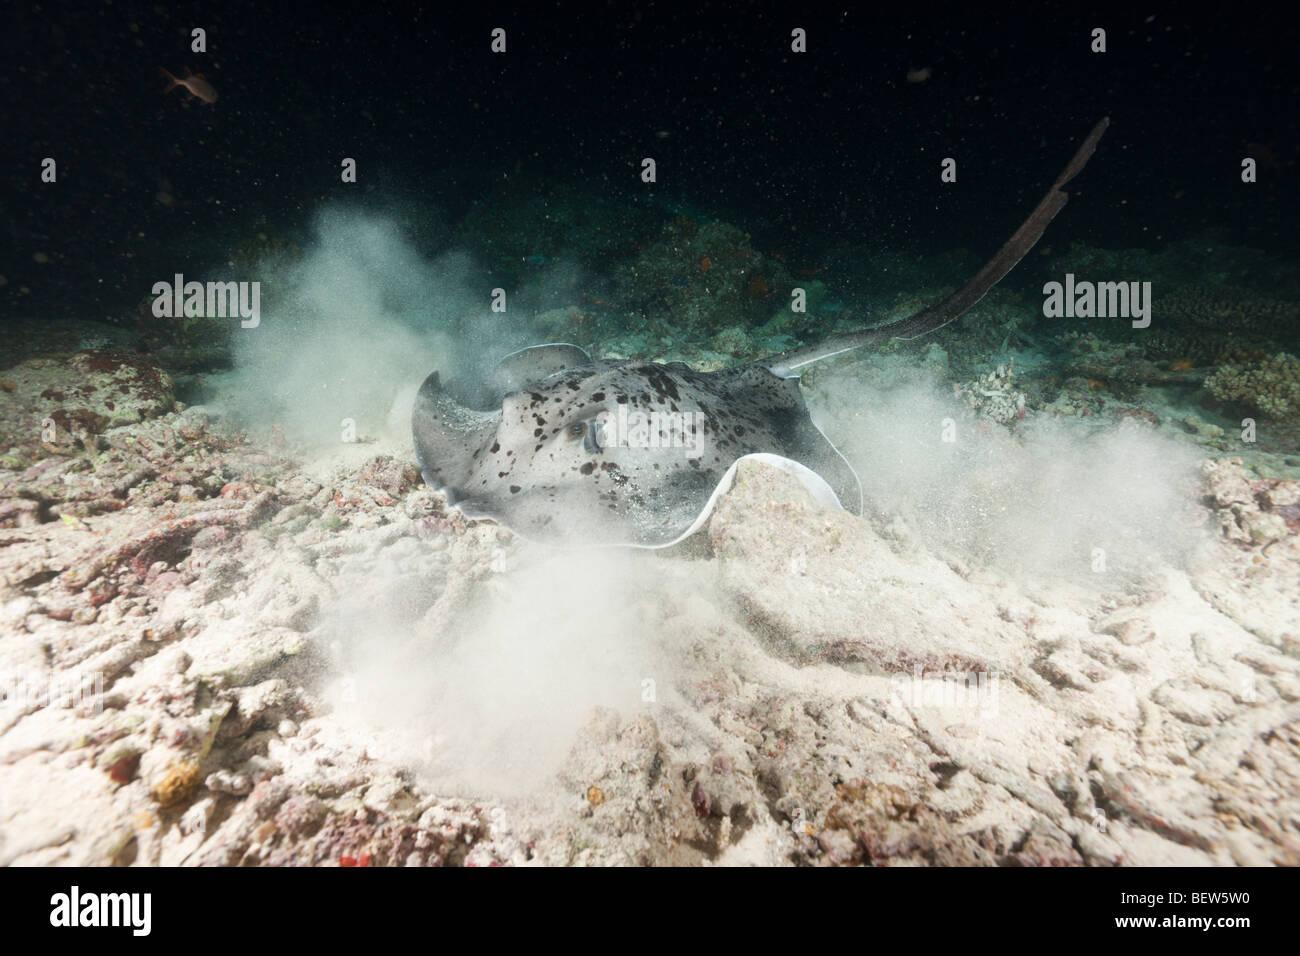 Blotched Fantail Stingray hunting at Night, Taeniura meyeni, Maya Thila, North Ari Atoll, Maldives - Stock Image